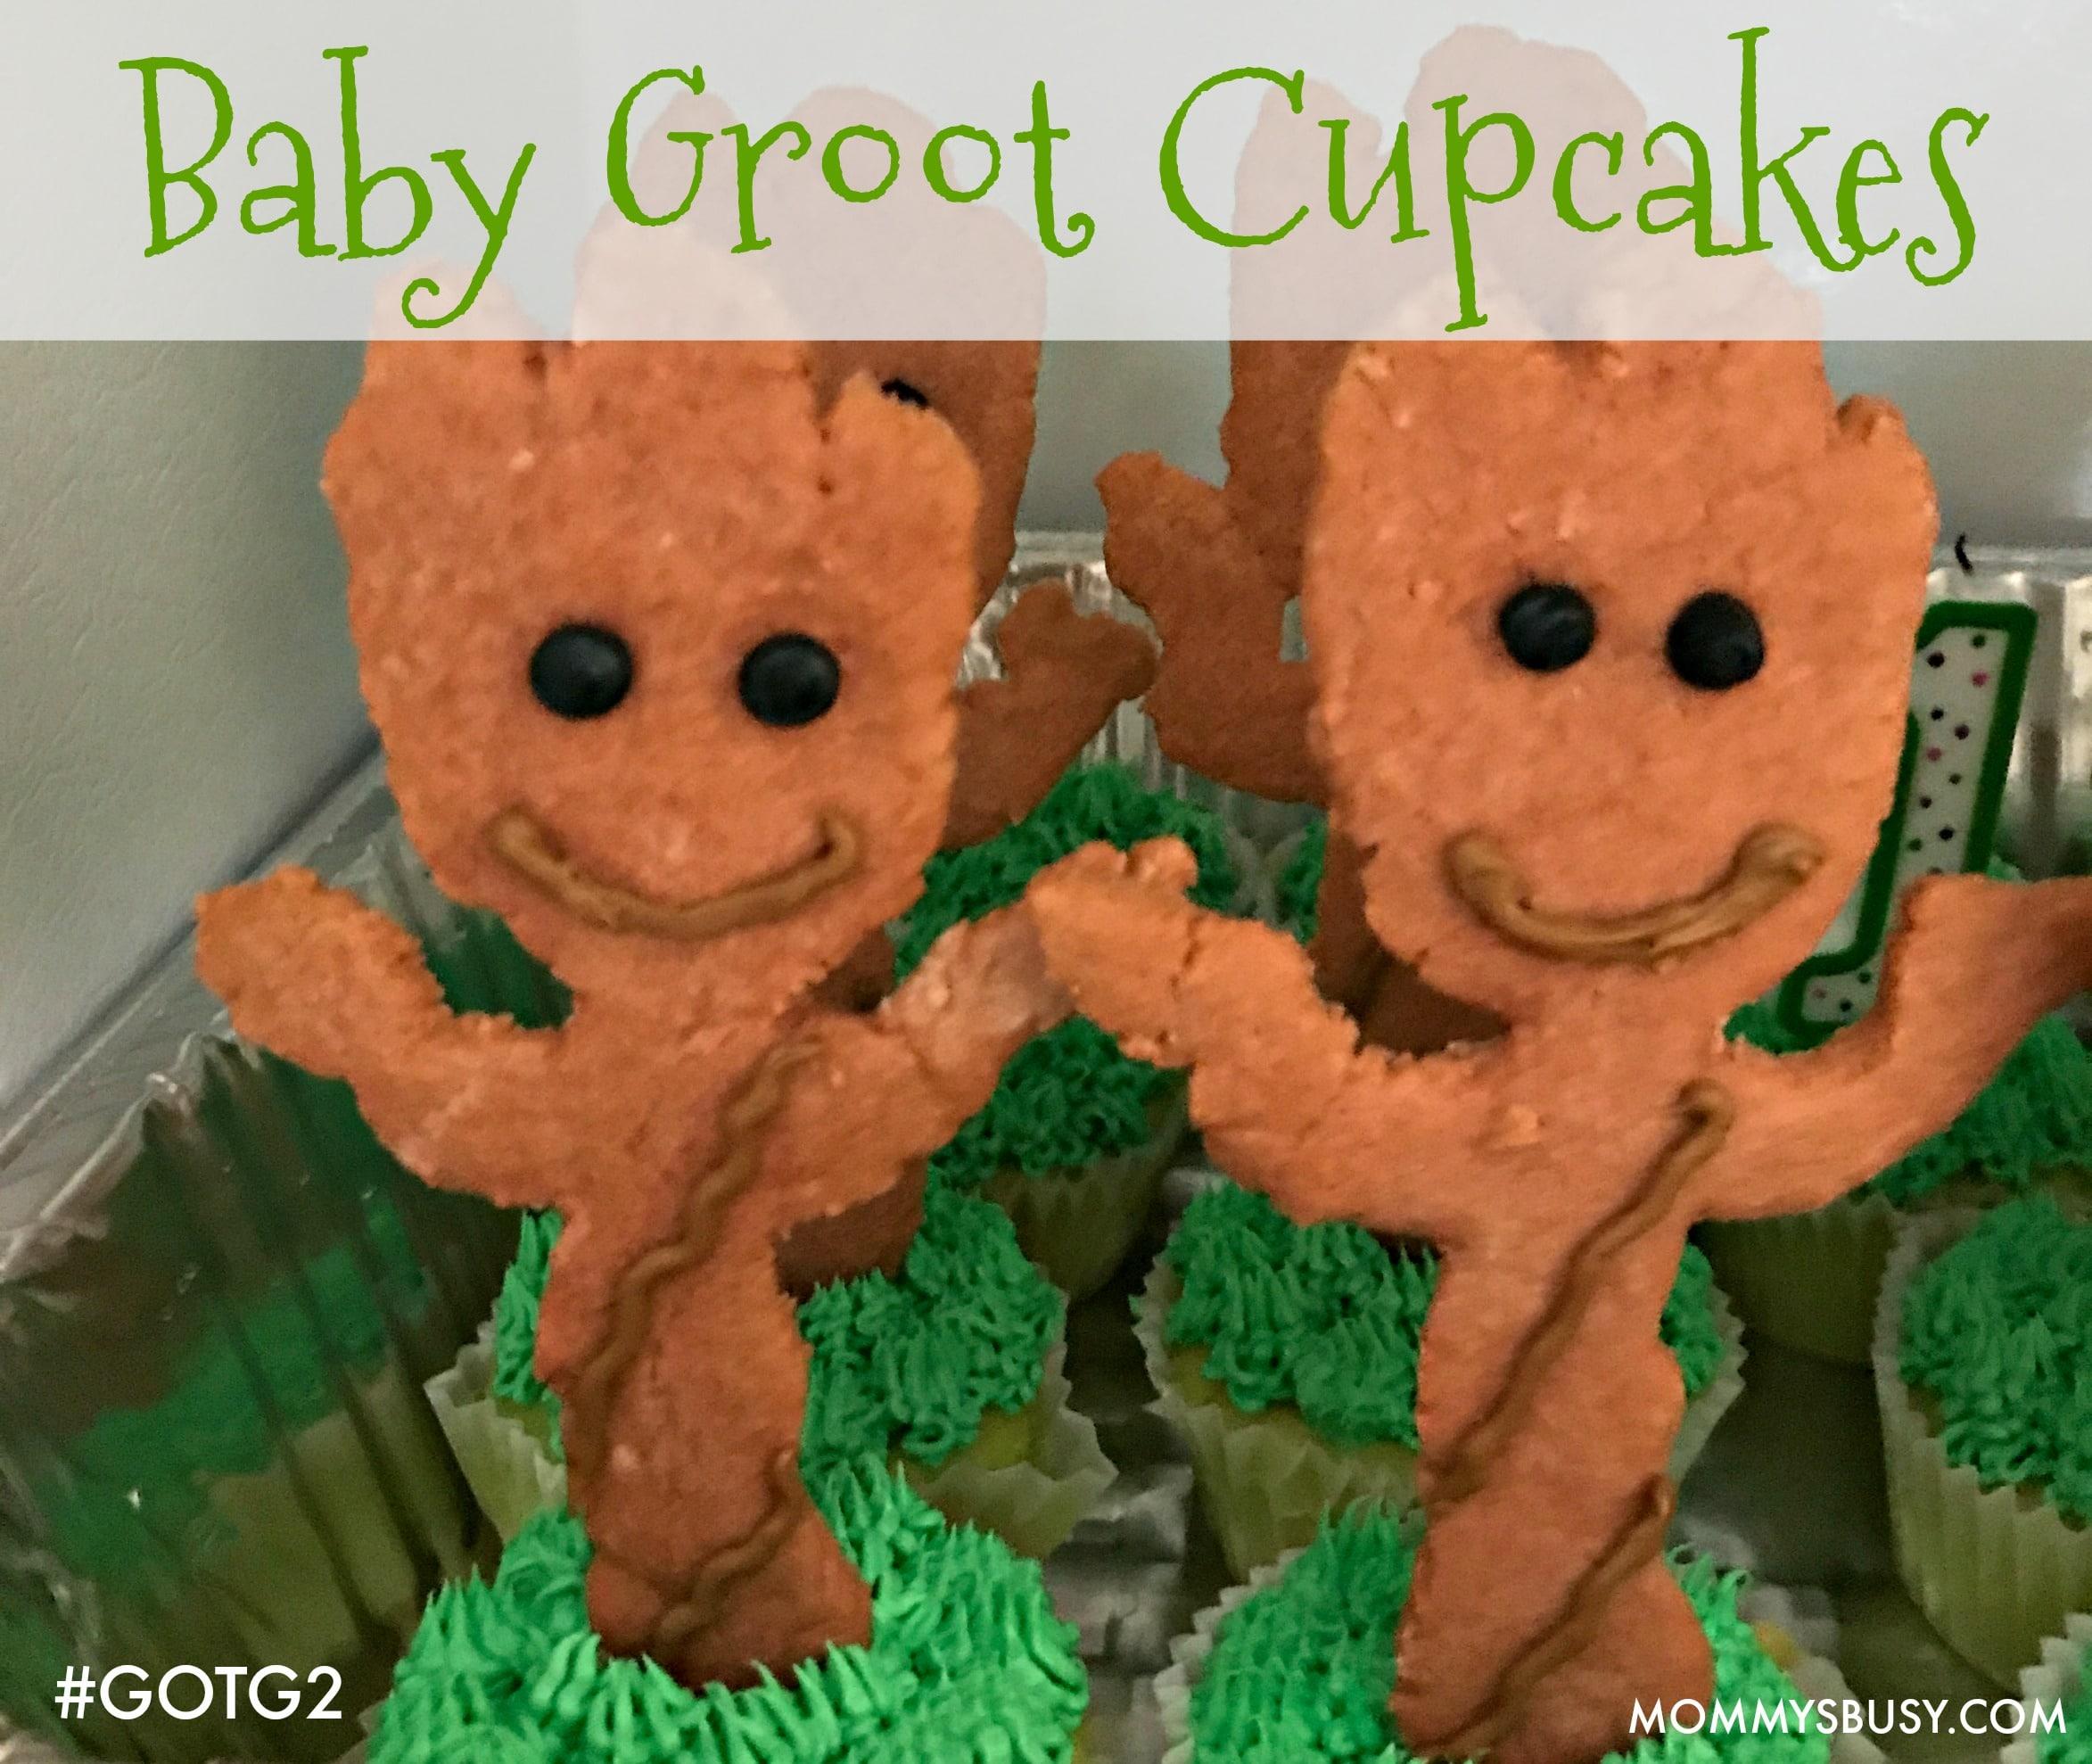 Baby Groot Cupcakes